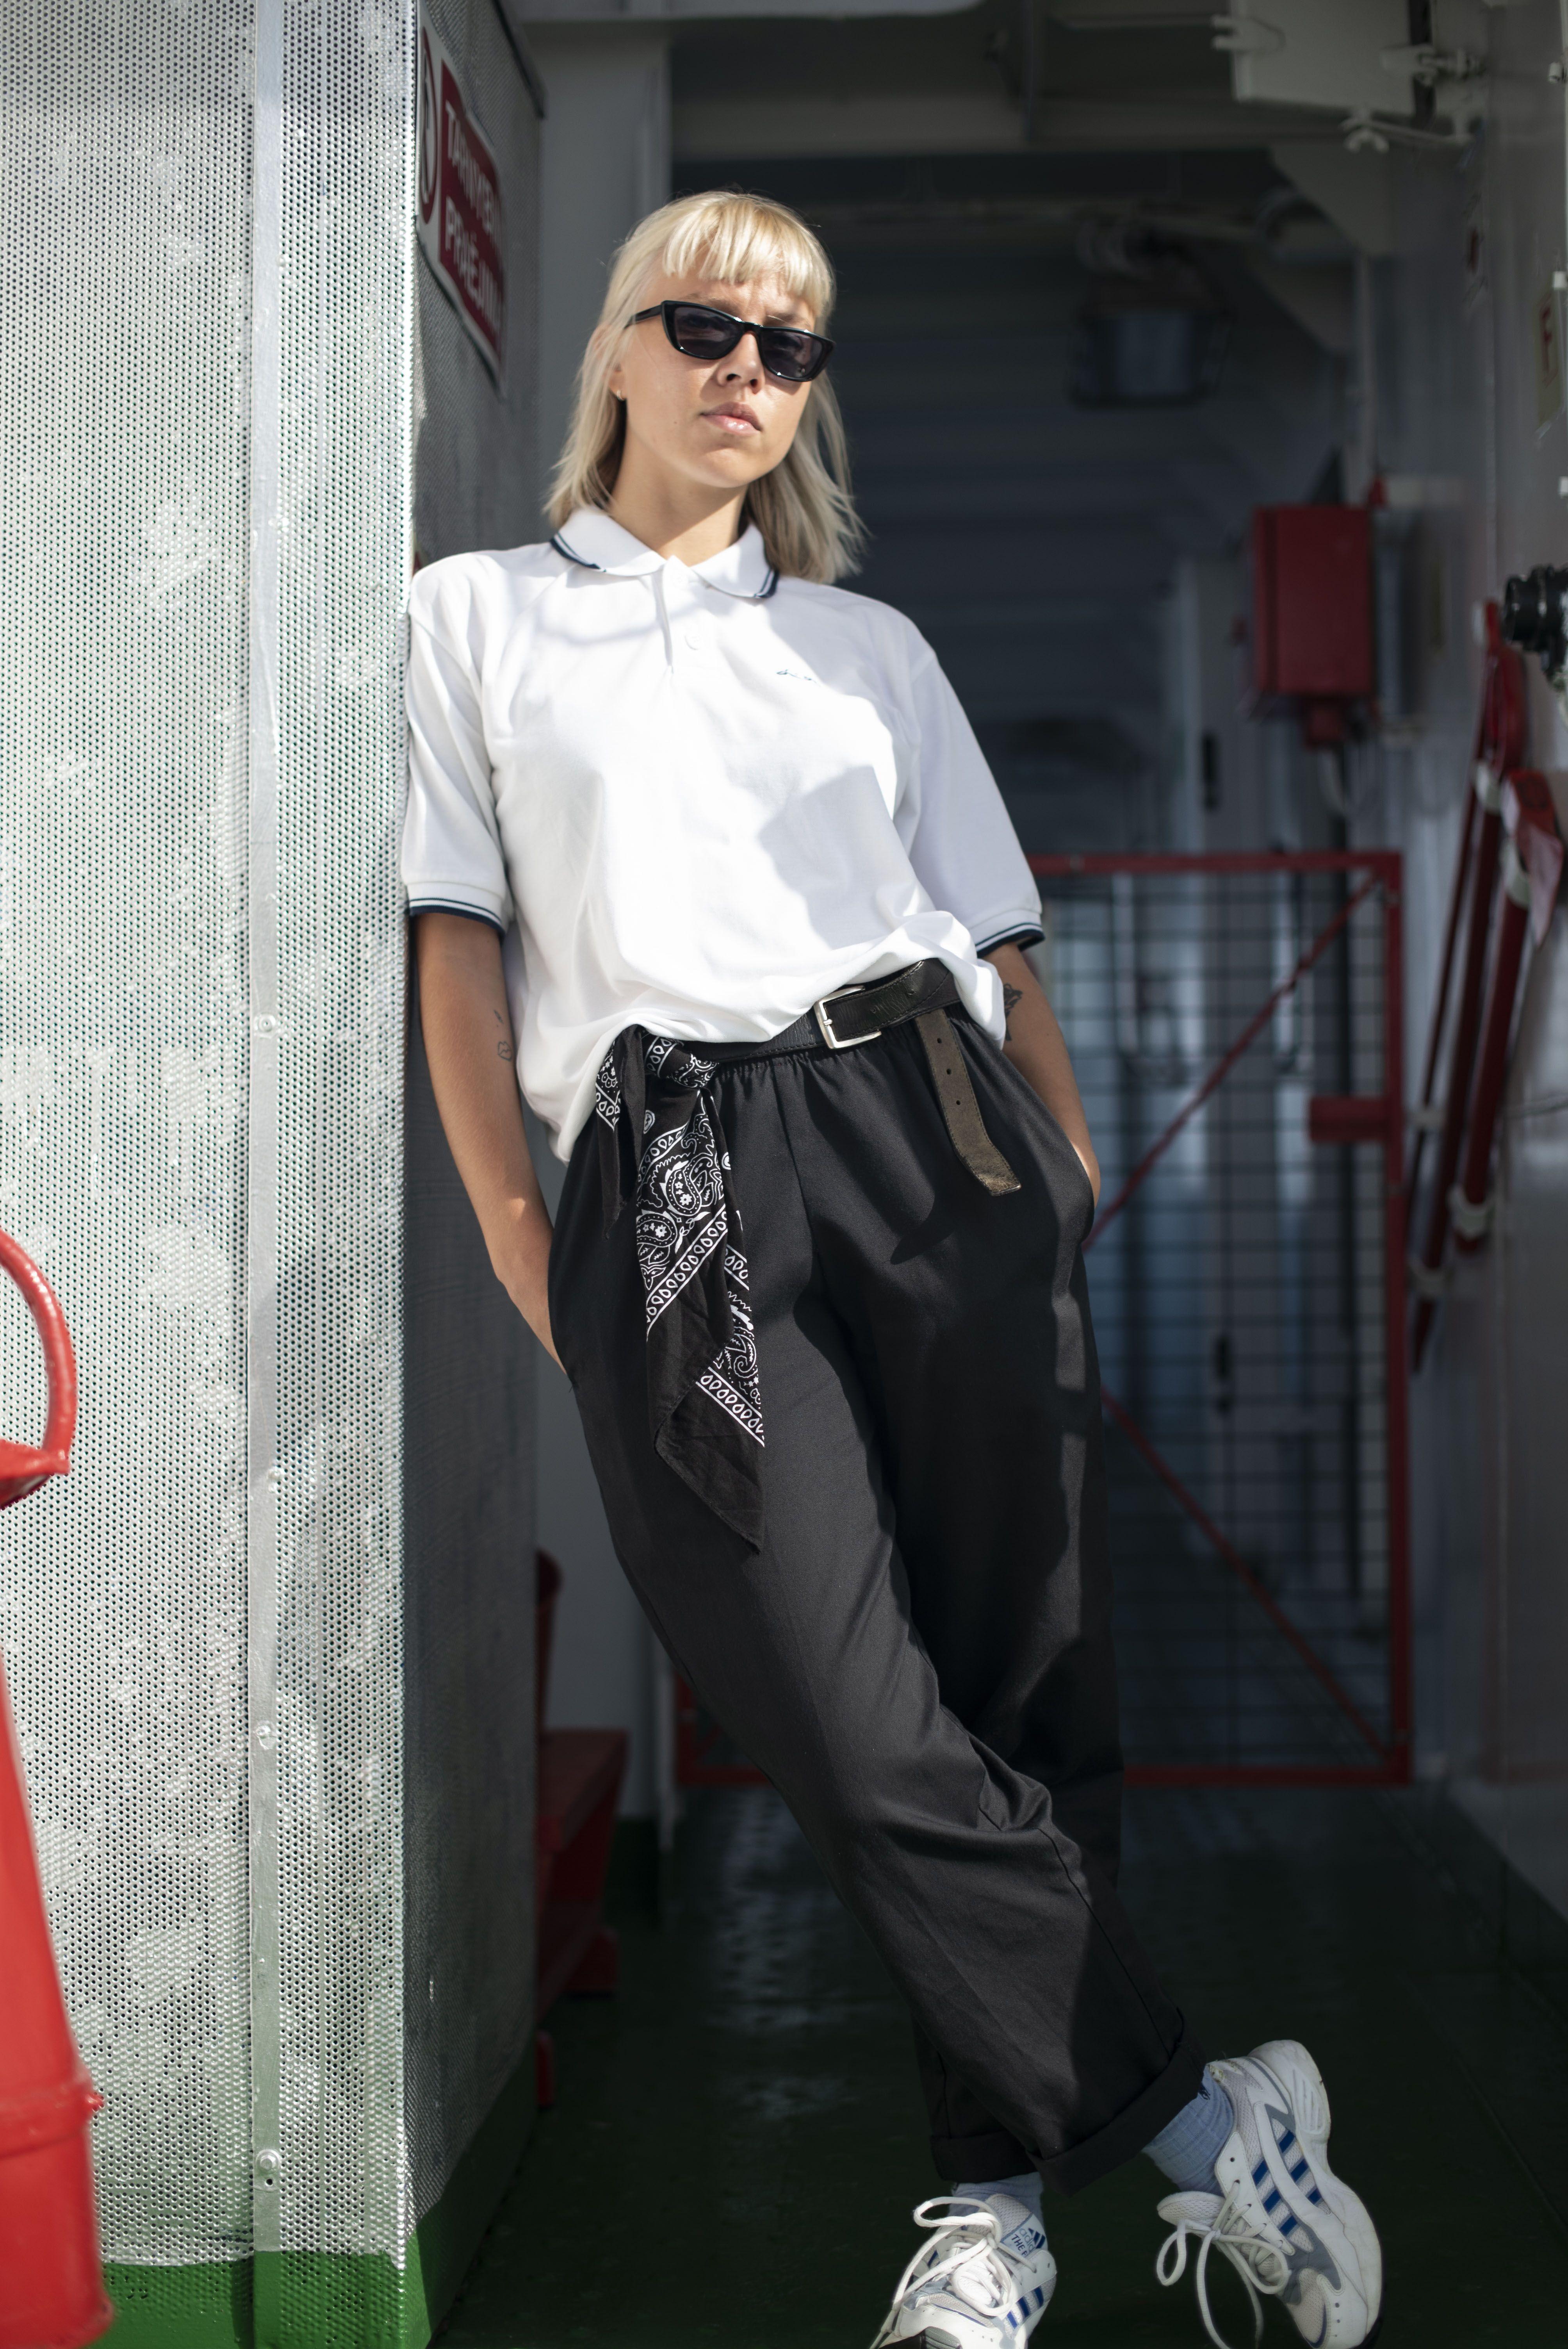 Kappa White Polo Shirt 90s Fashion Outfits Vintage Outfits Fashion Outfits